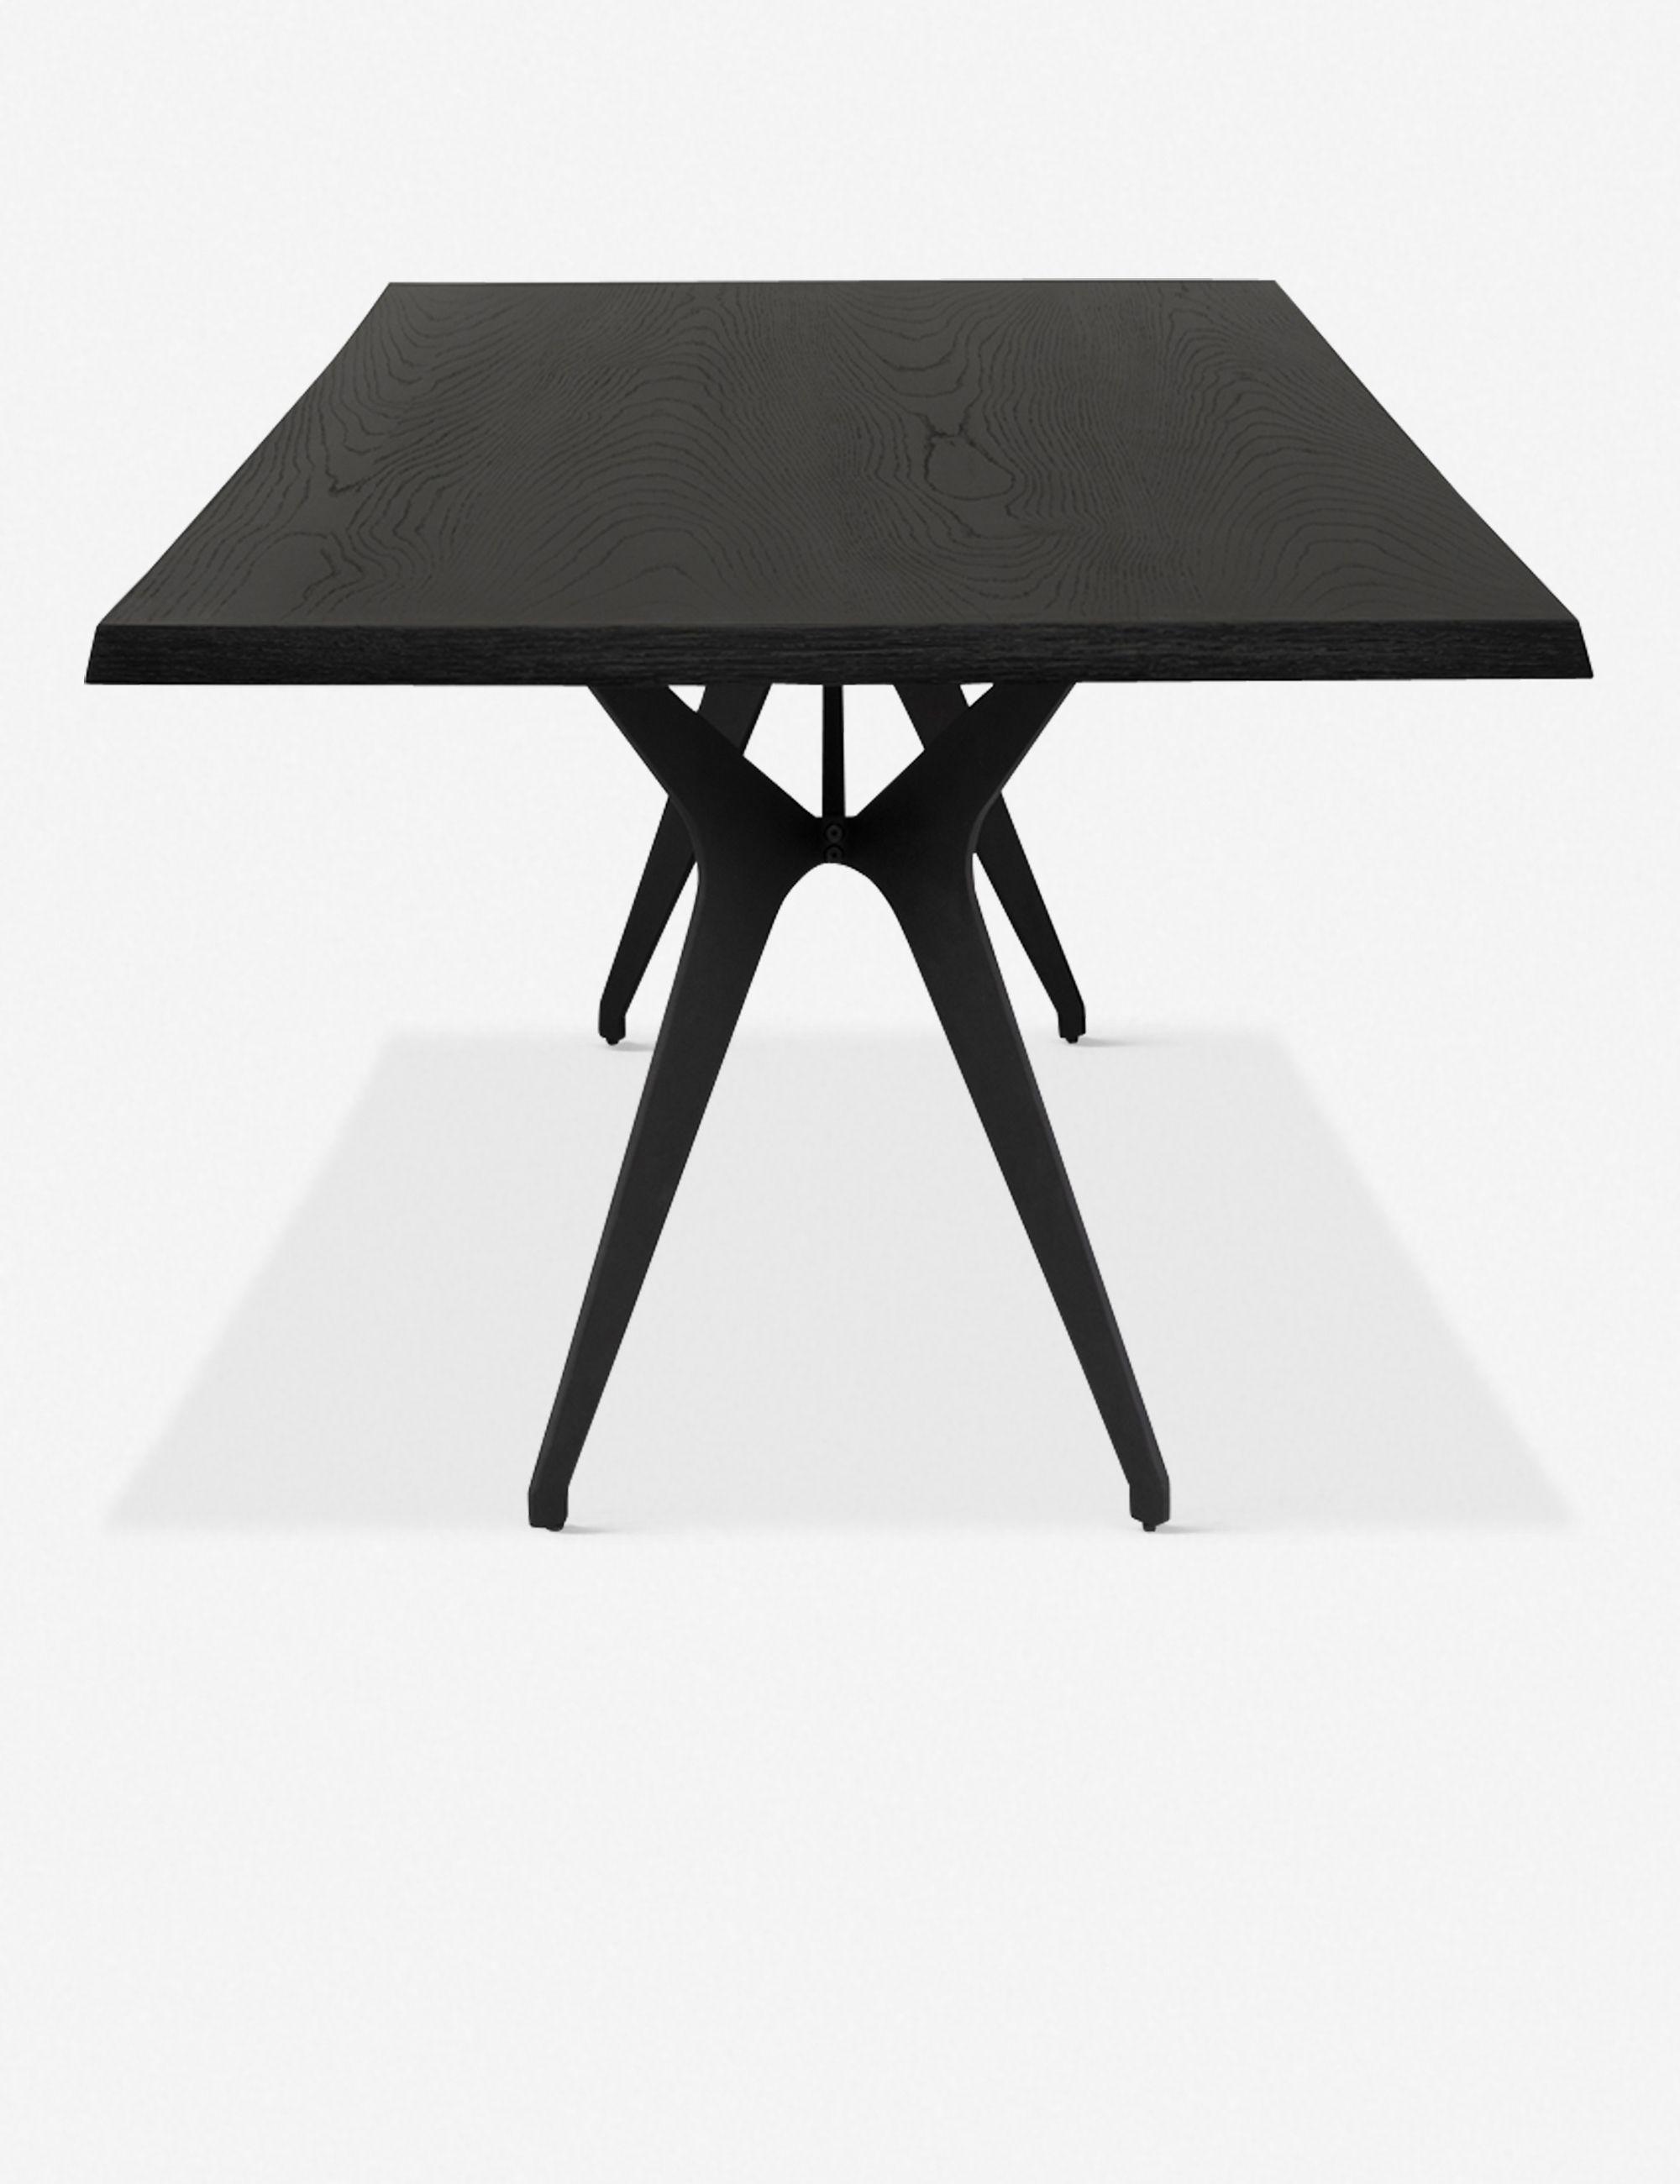 Eden Kleiner Esstisch Onyx Dining Table Small Dining Table Modern Table